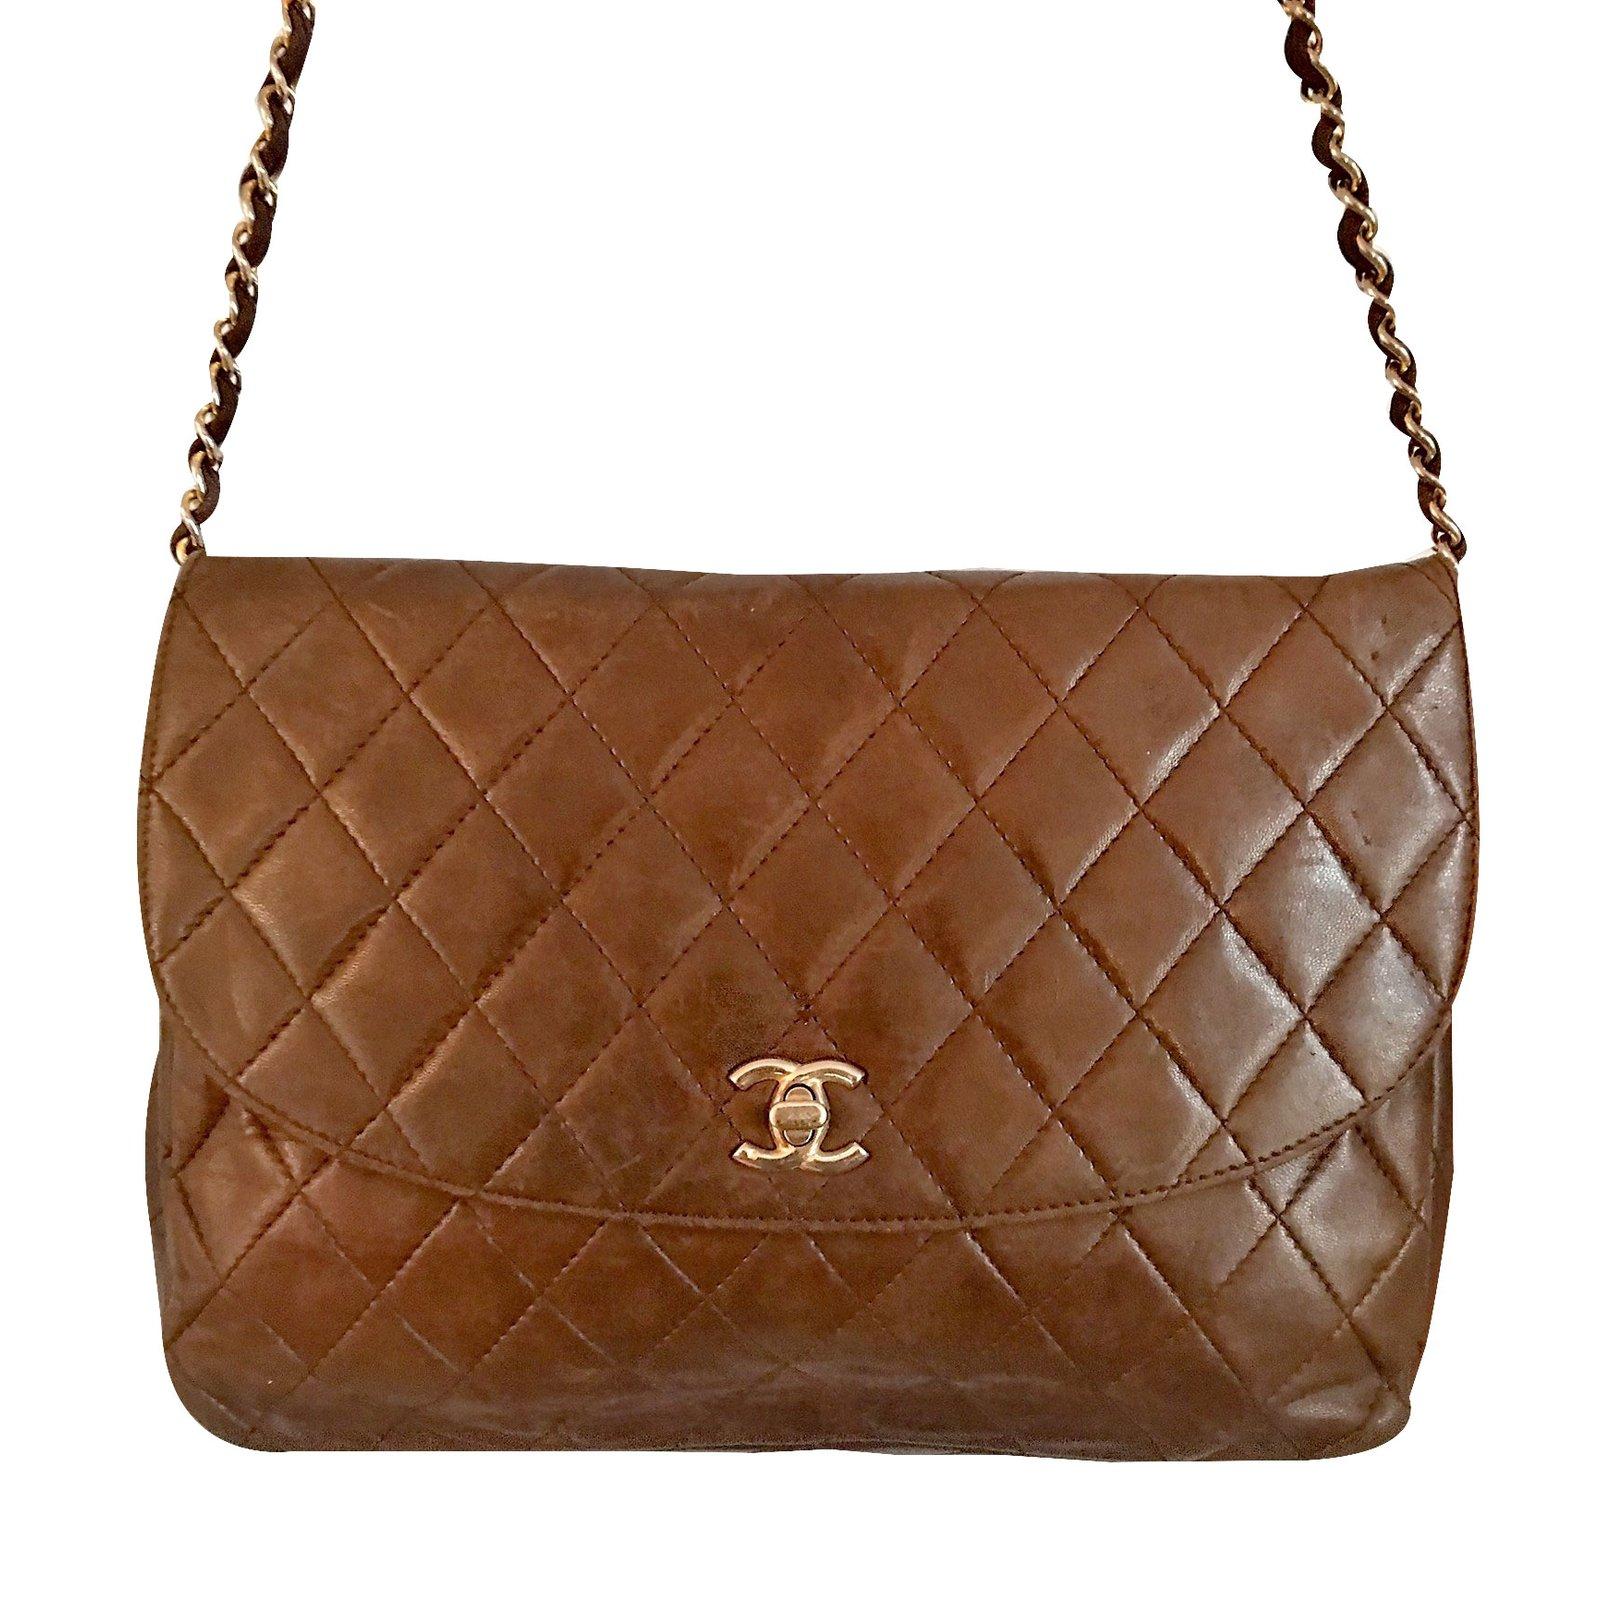 Sacs A Main Chanel Sac Matelasse Cuir Marron Ref 25368 Joli Closet